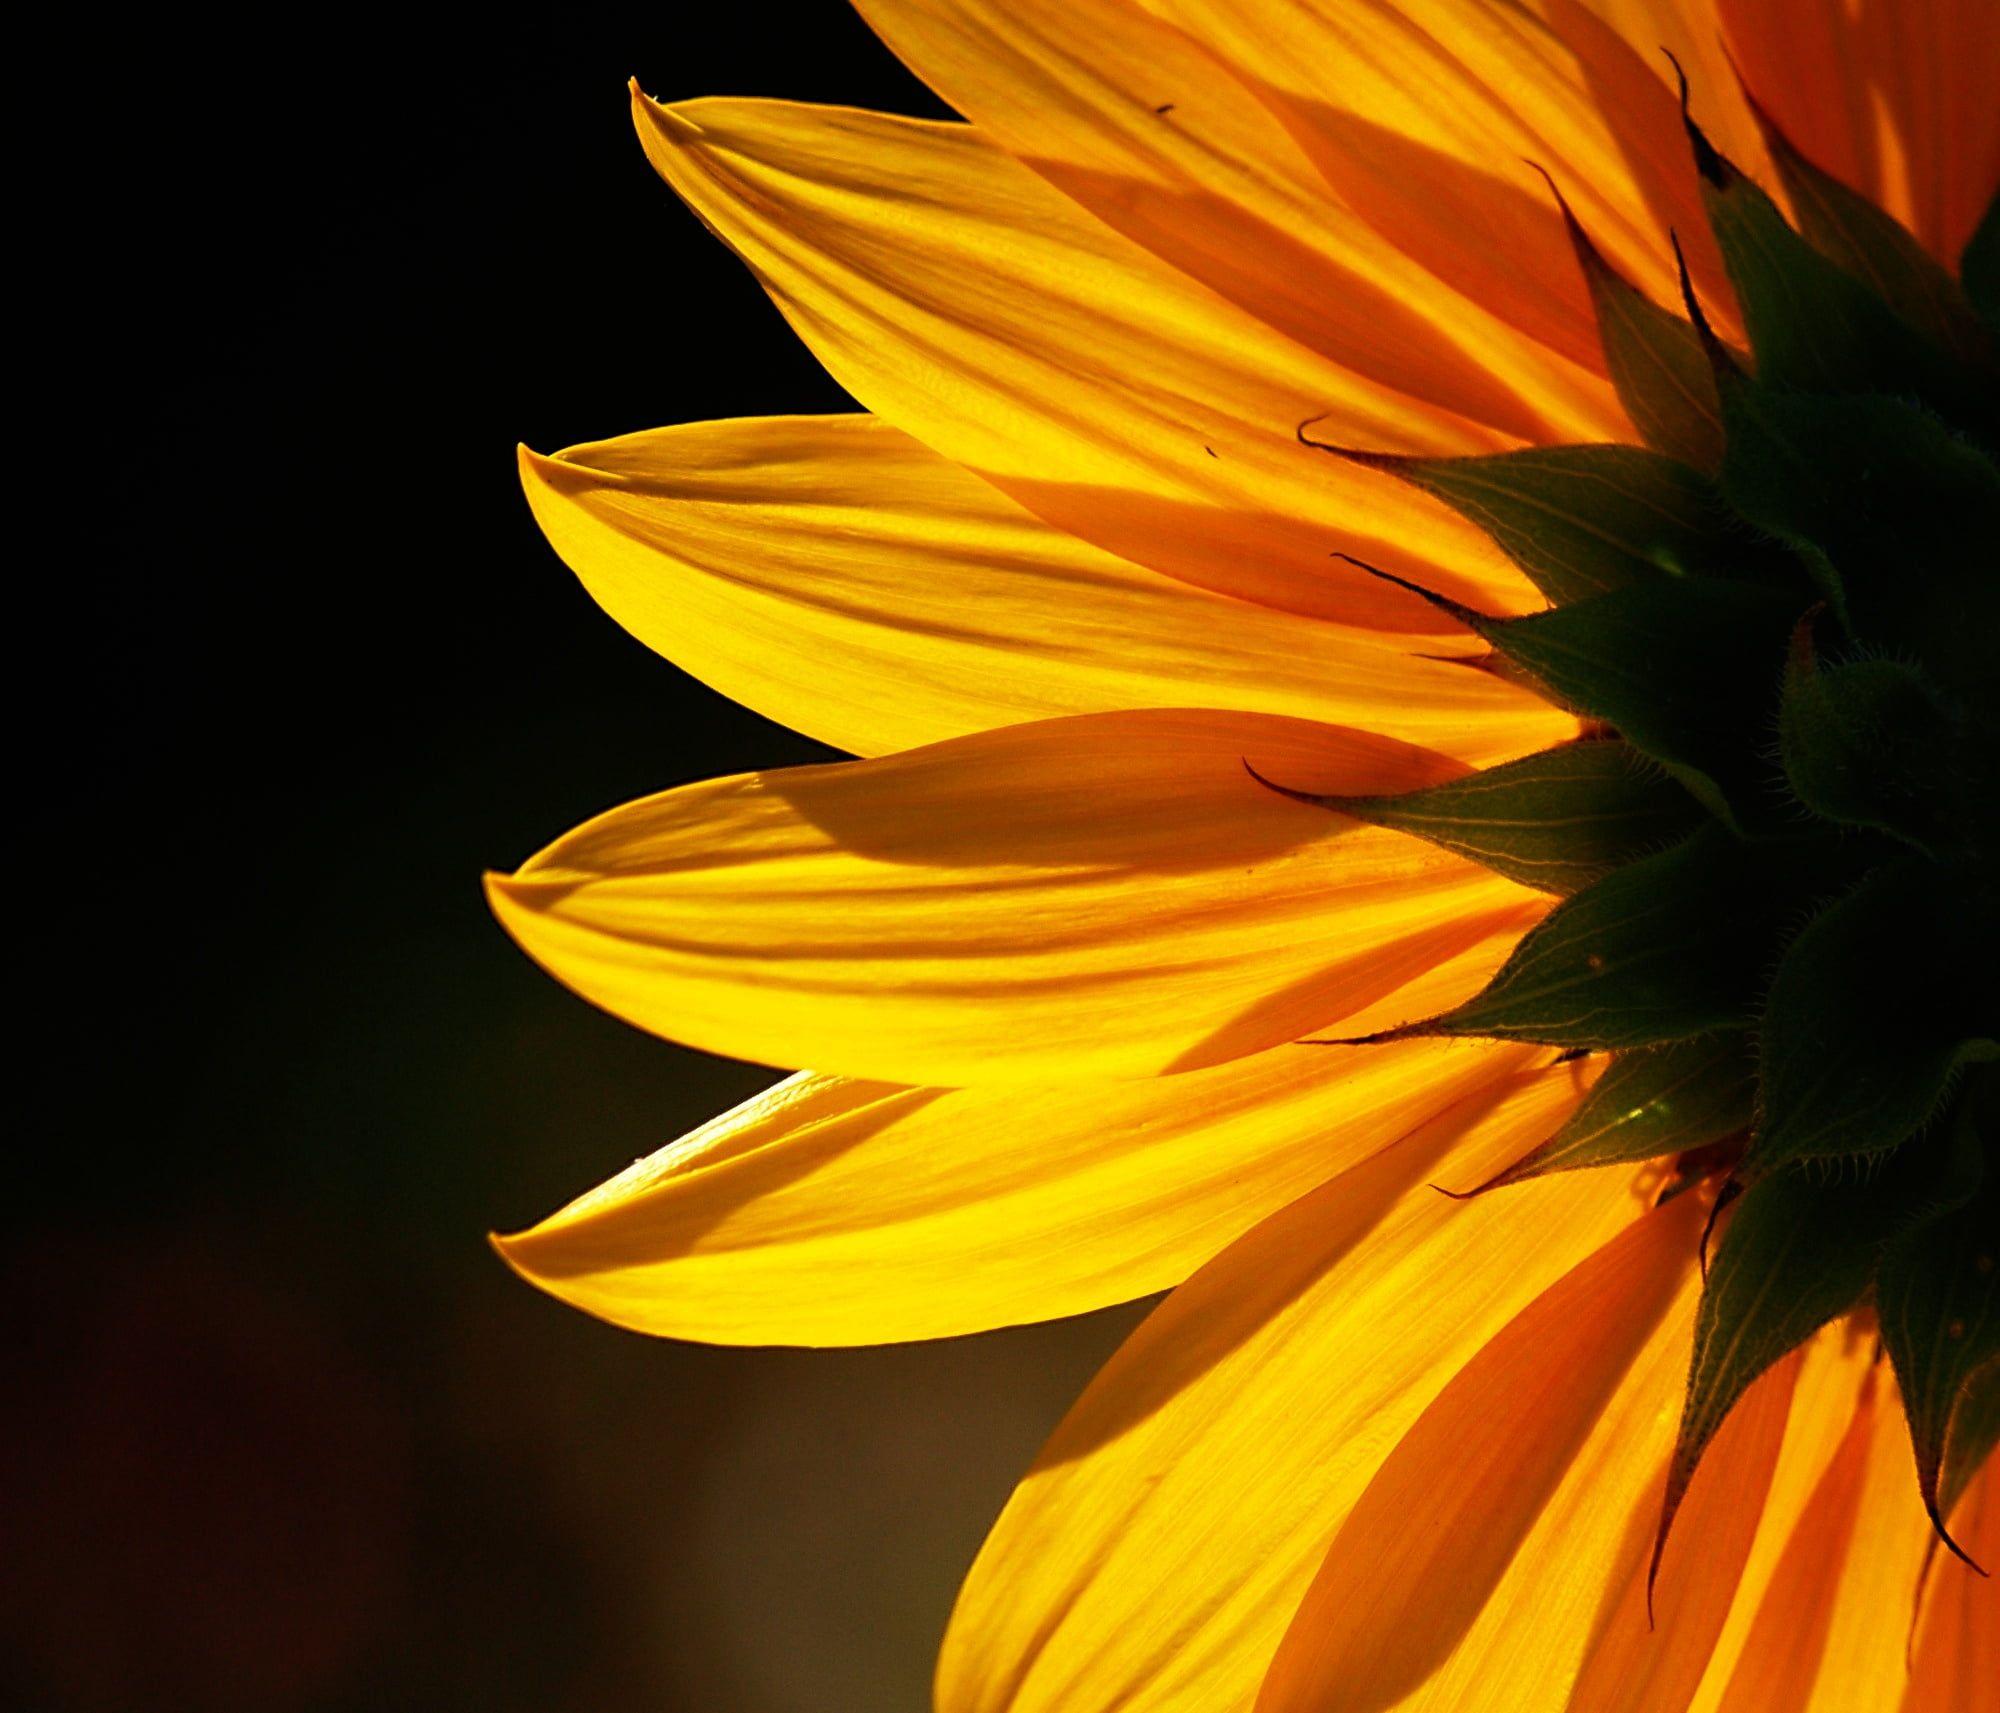 Yellow Sunflower Flower Close Up Photo Sunflower Backlit